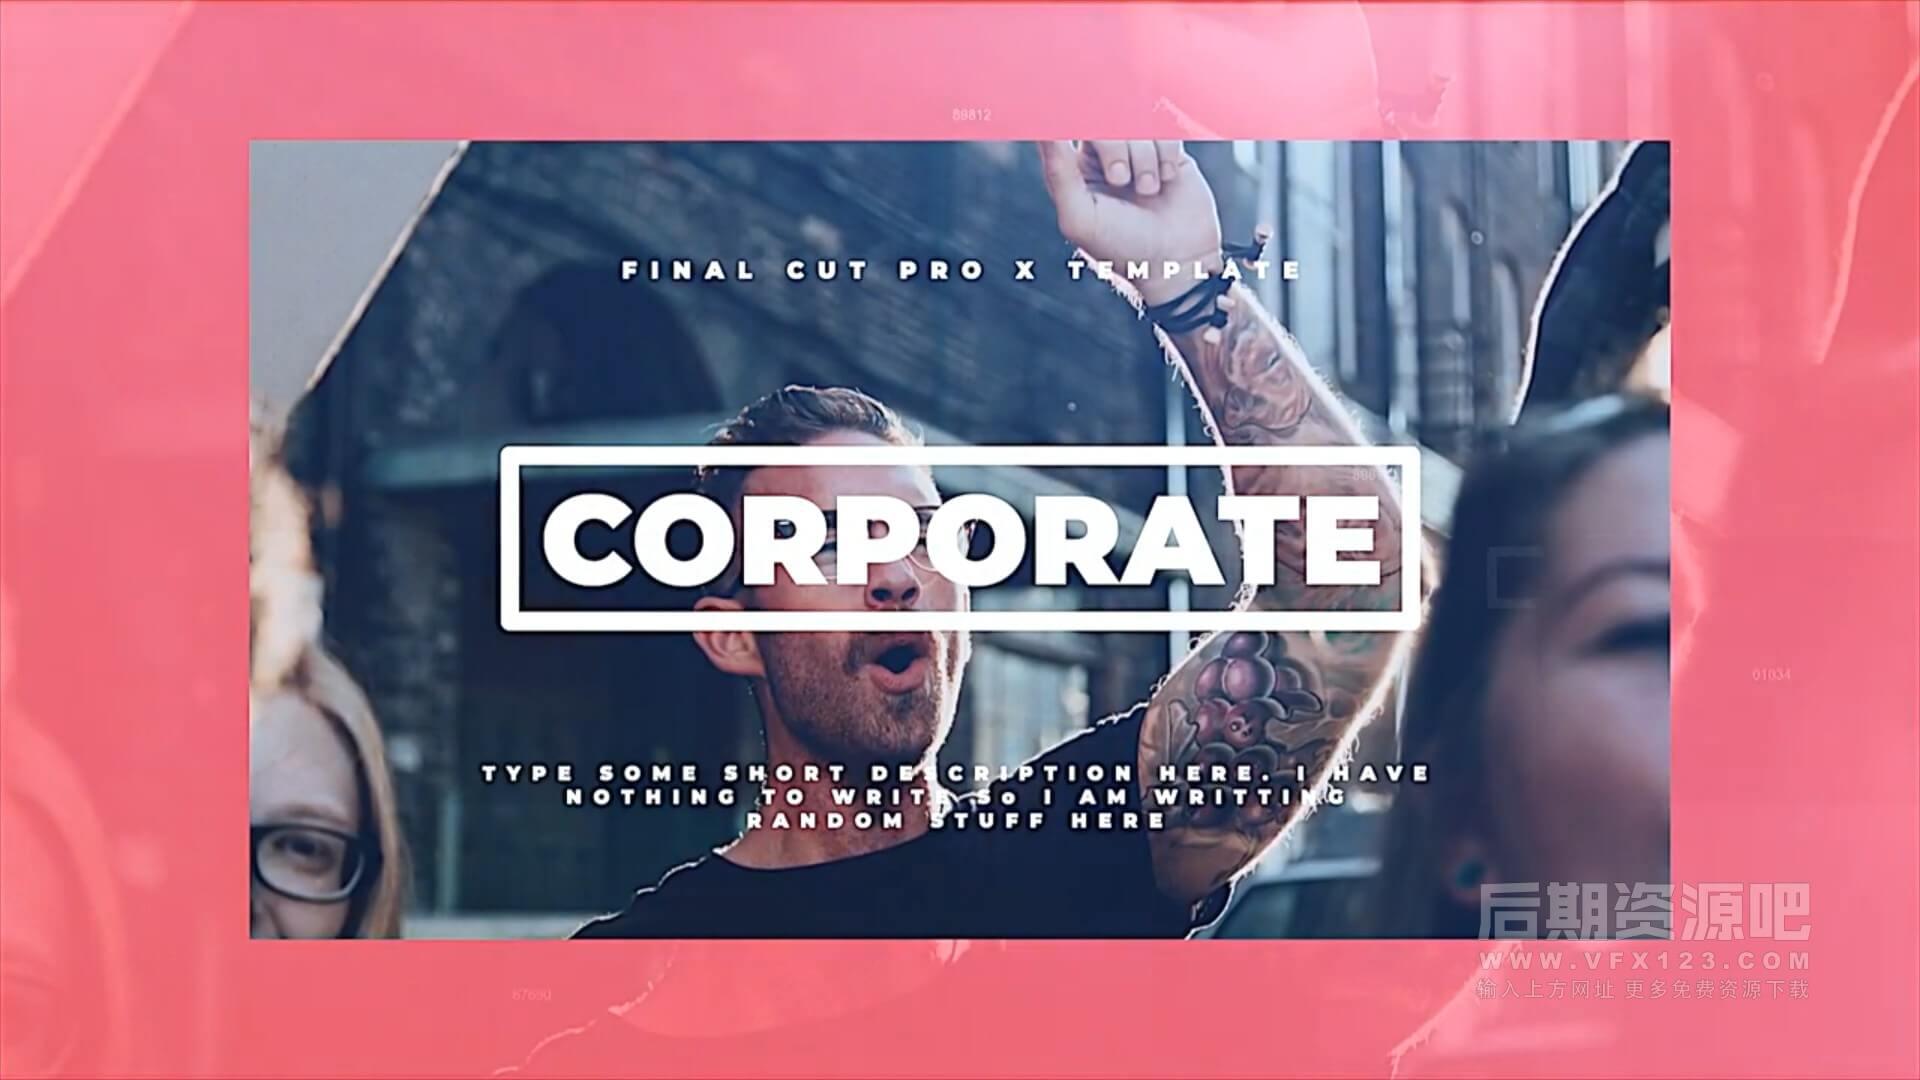 Fcpx主题模板 简洁大方商务公司展示宣传片片头模板 Corporate